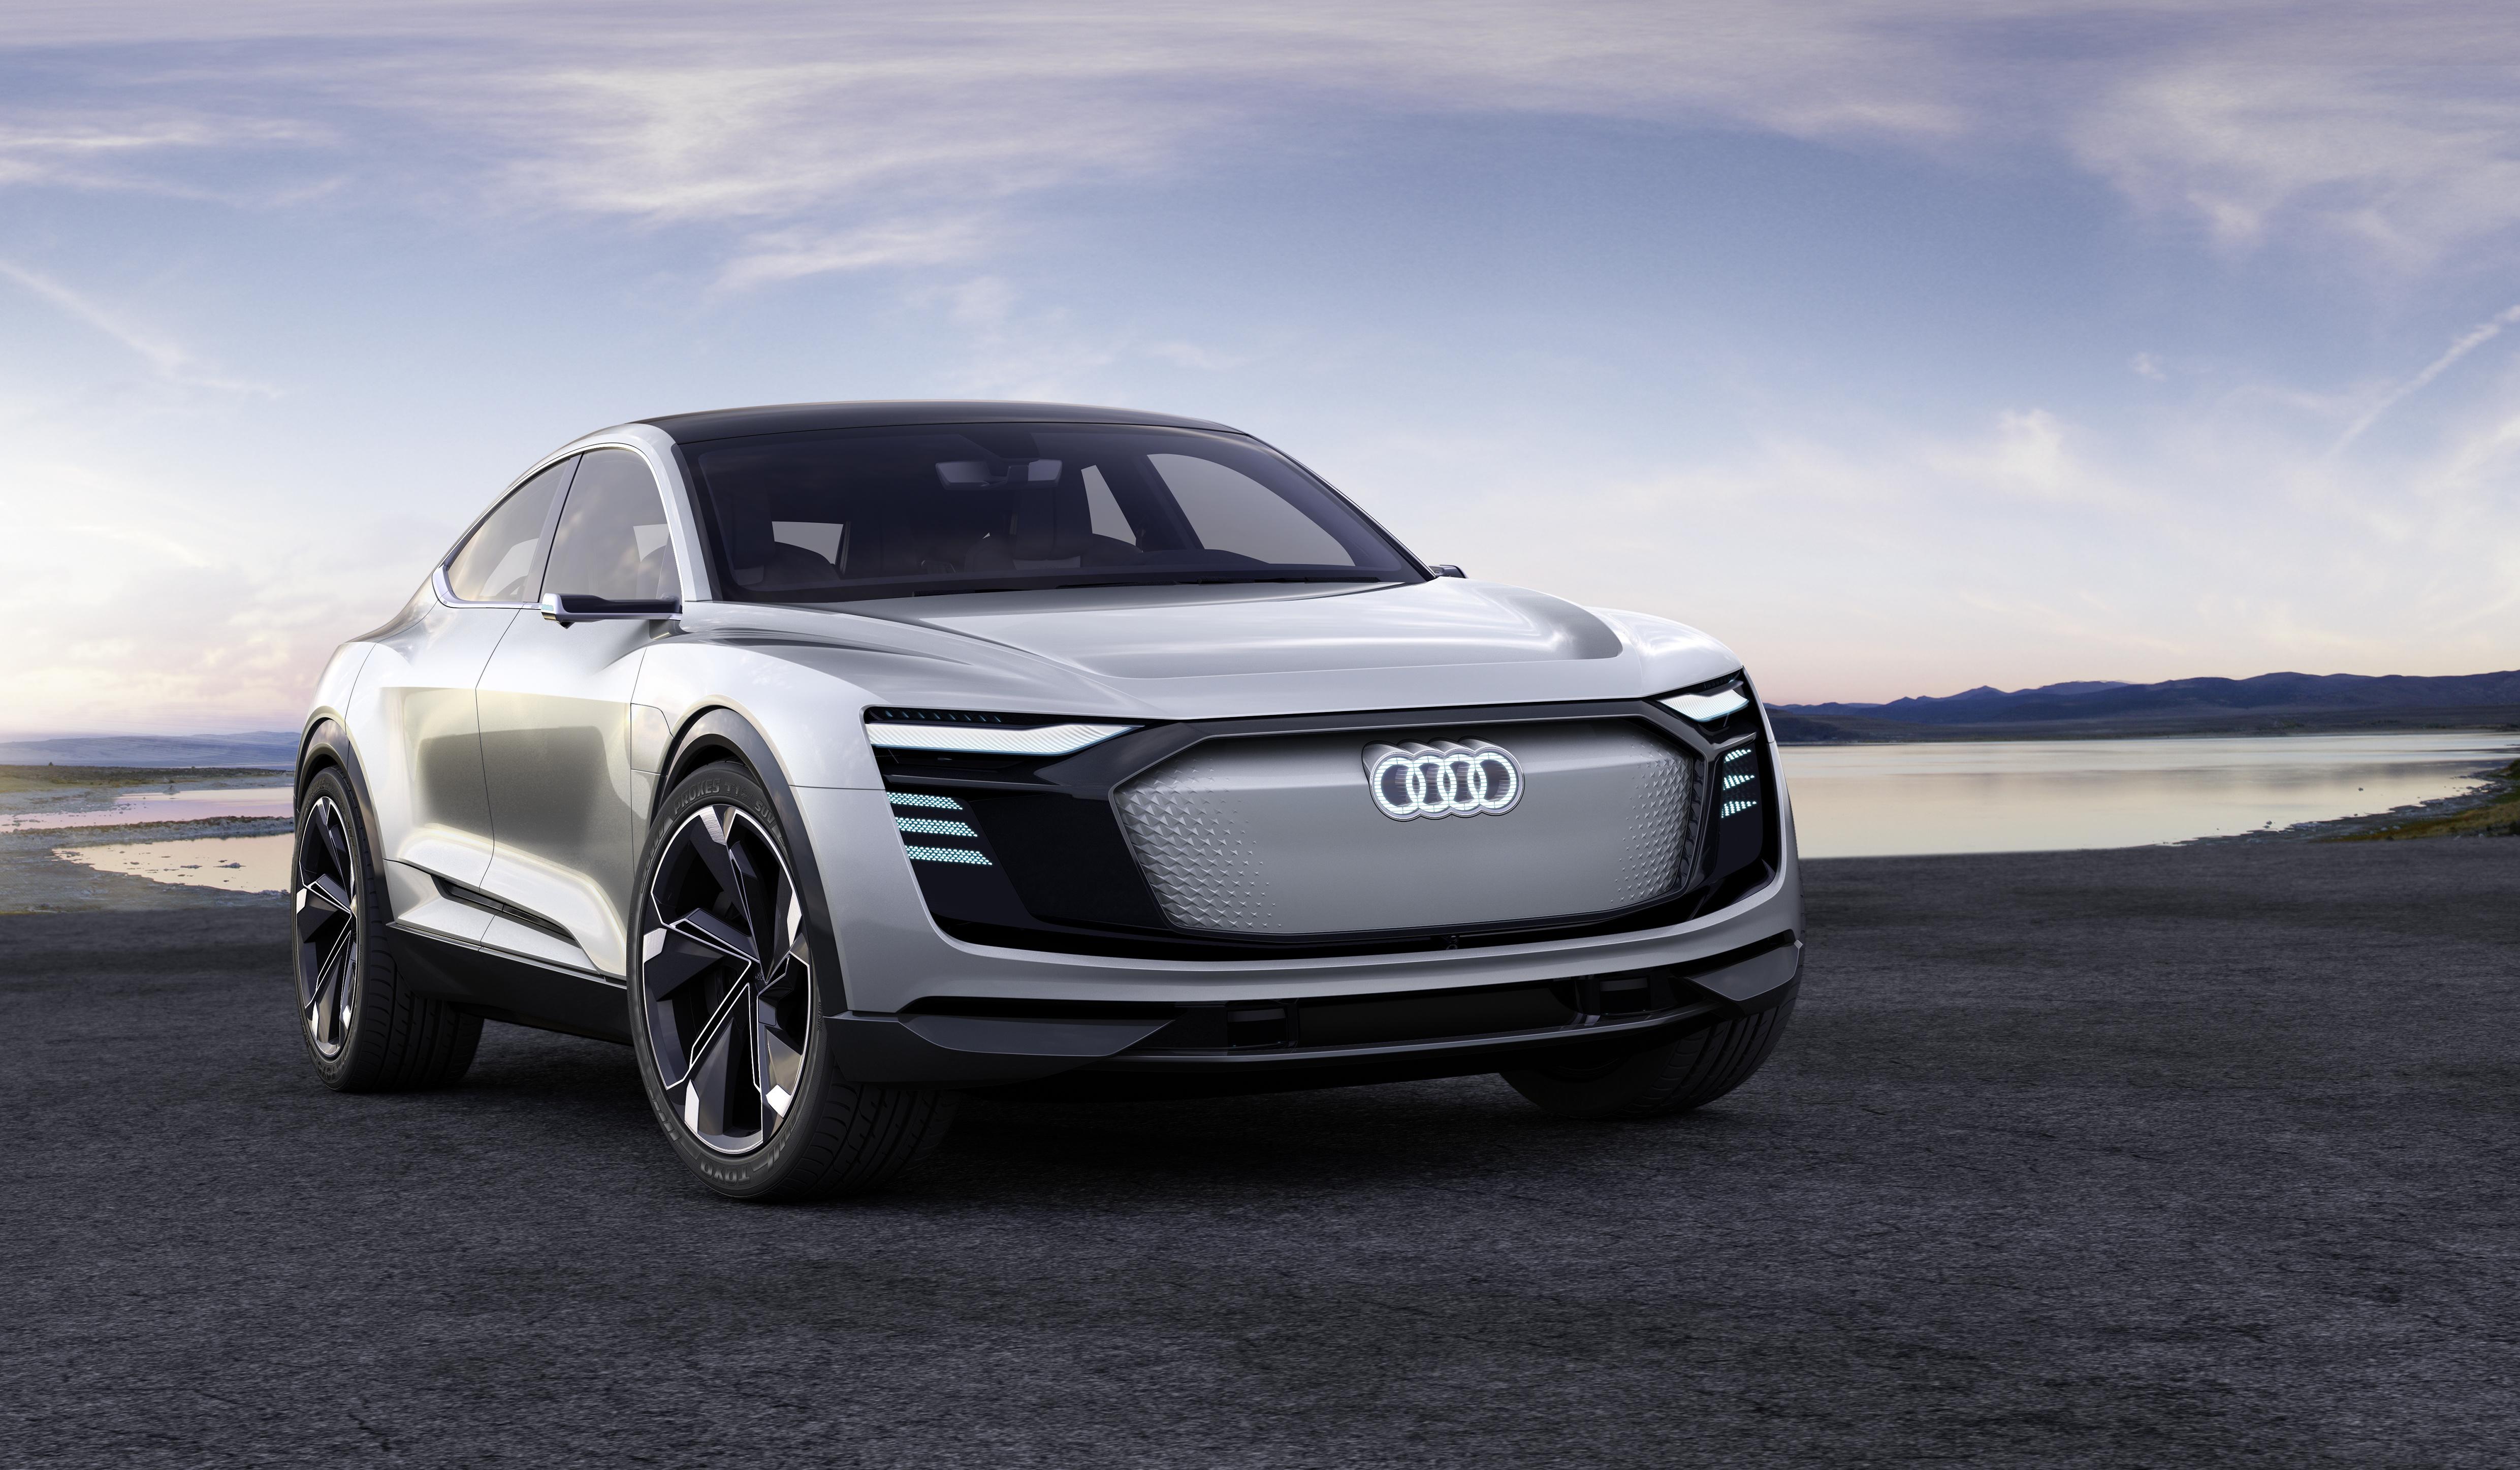 Audi Elektrikli Otomobil Konsepti Gran Turismo Audi e-tron Sportback'i Tanıttı